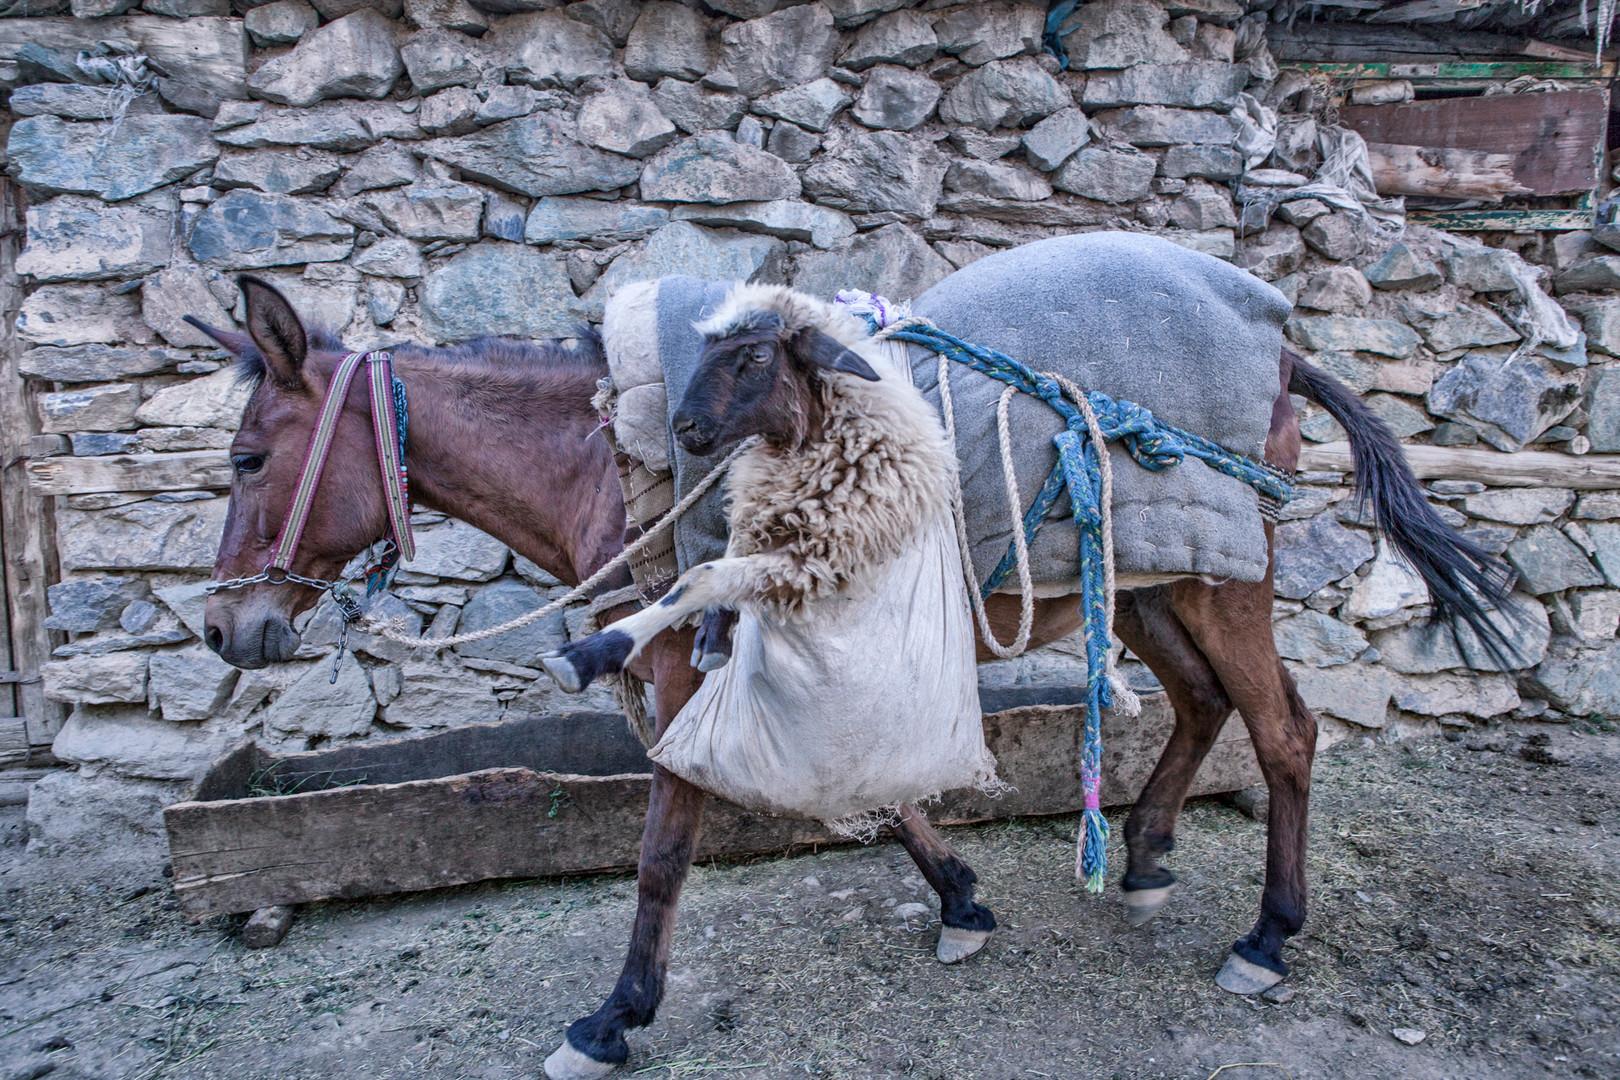 The Sheep in the Saddlebag. The horse carries the sheep to the barn. Bilgi, Van. June 2017.